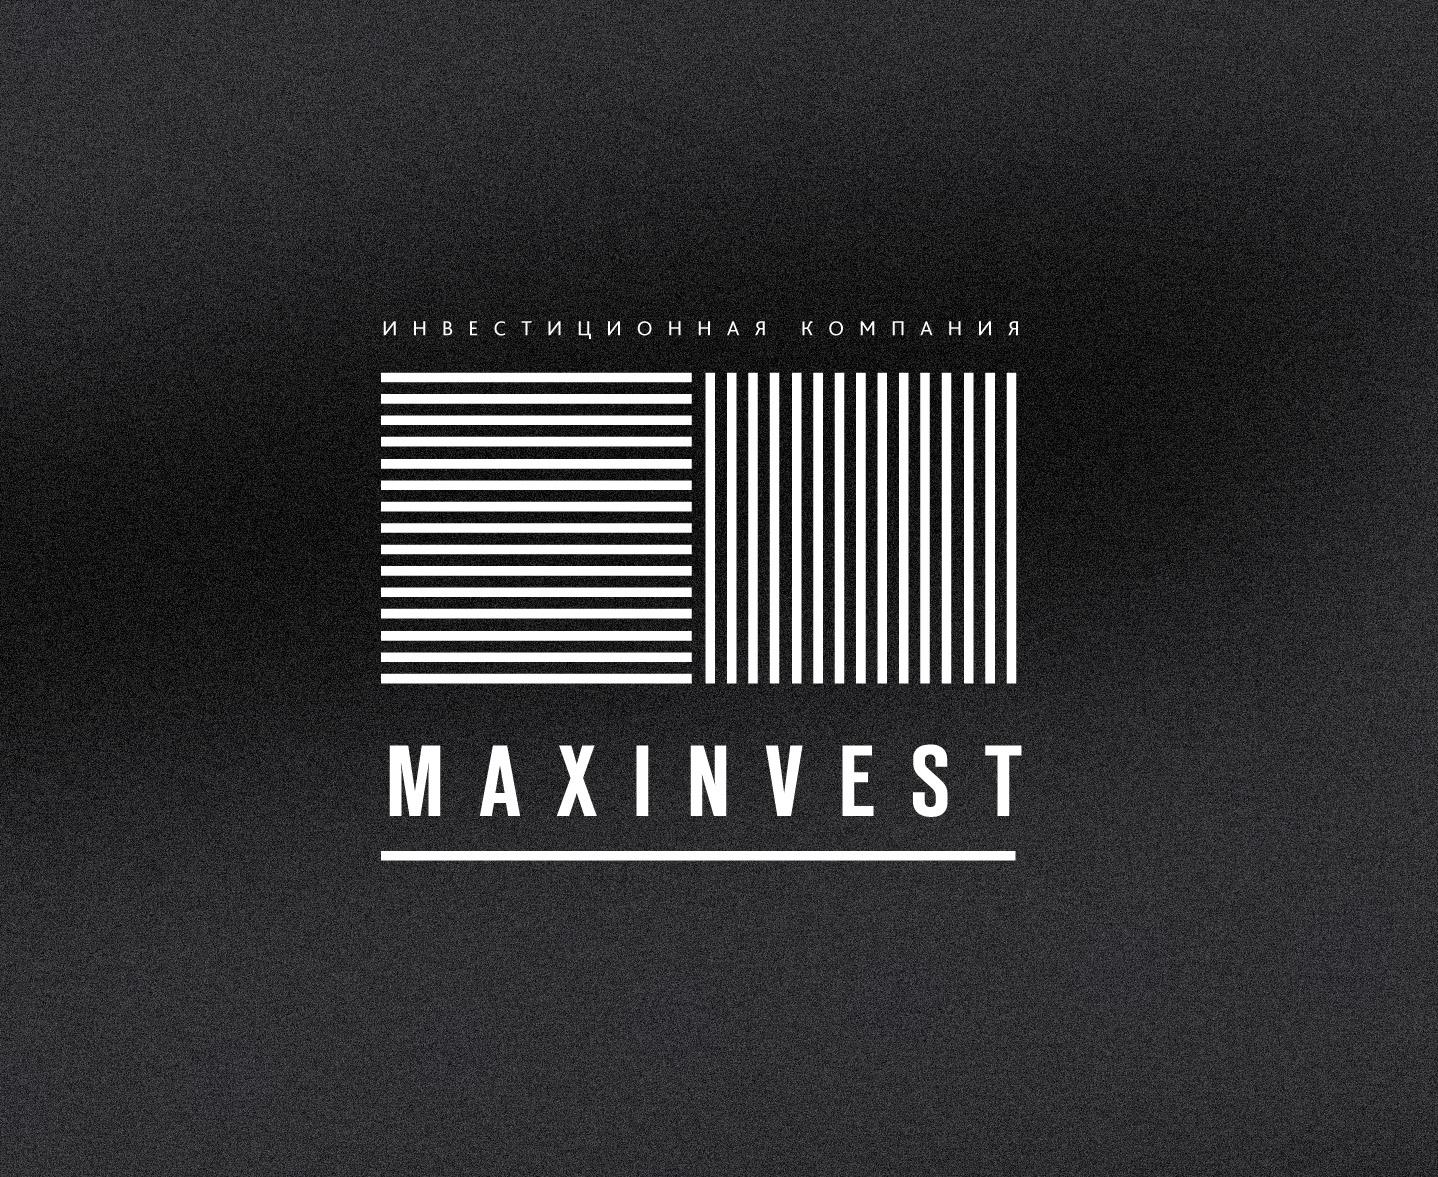 Логотип, фирменный шрифт, фирменный бланк фото f_5345acf94d60305d.jpg